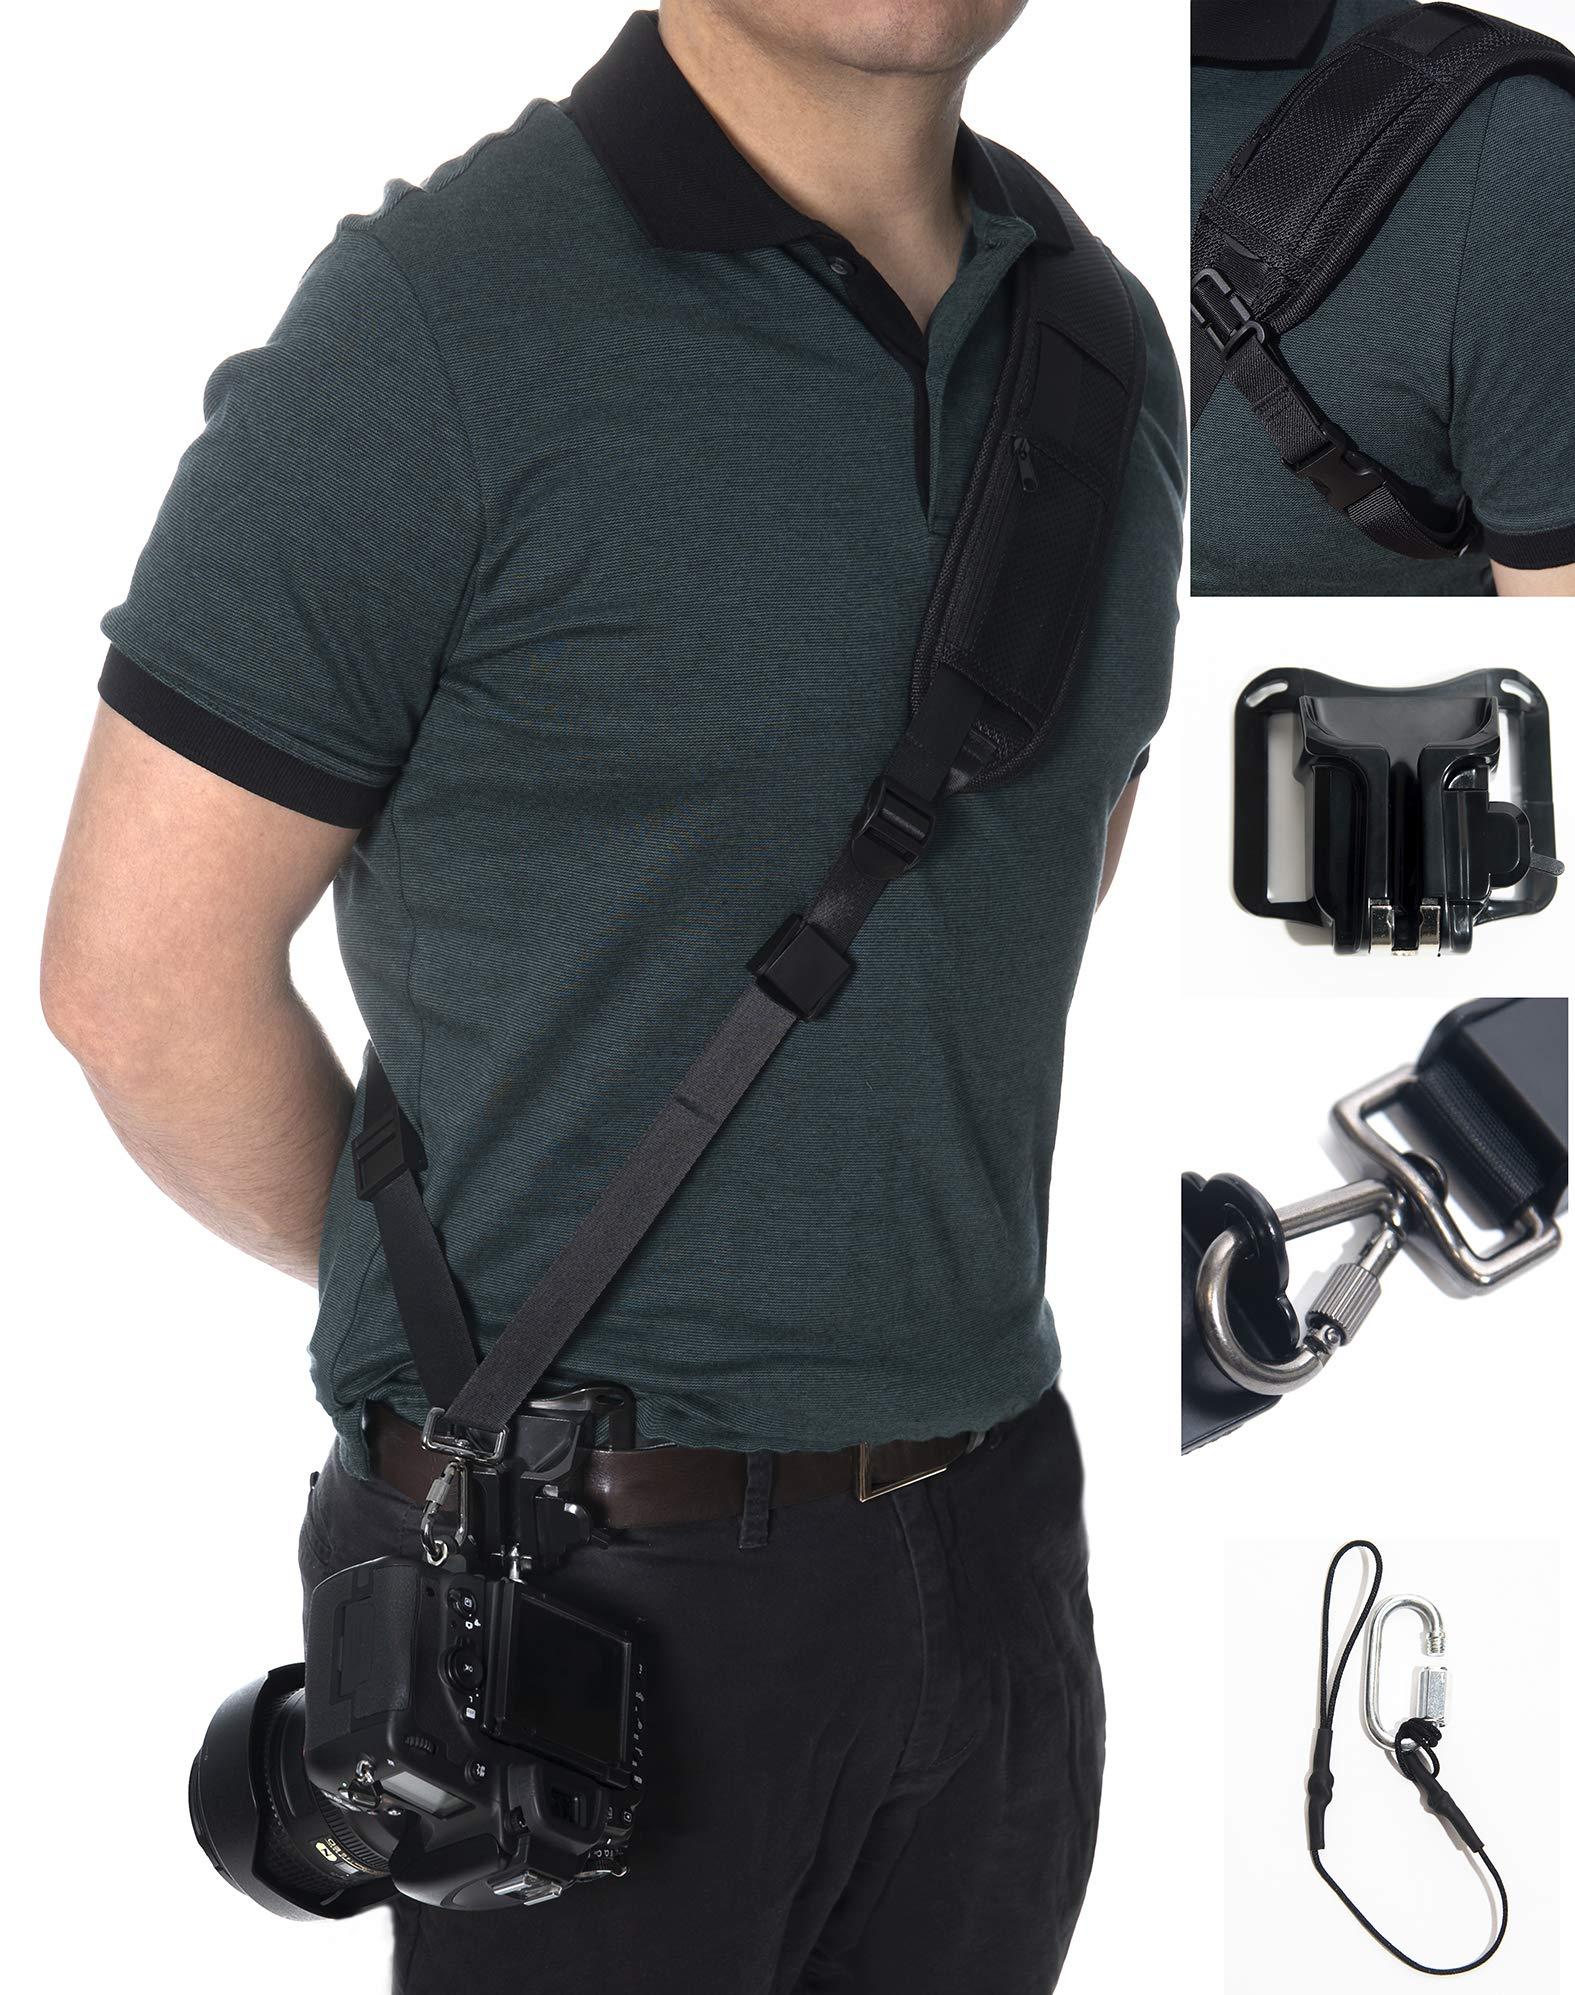 Camera Neck Shoulder Strap Sling with Quick Release Storage Safety Theather Belt Clip Holster Holder DSLR Accessories (Black-Camera Shoulder Strap with Belt Clip) by Electronics HQ